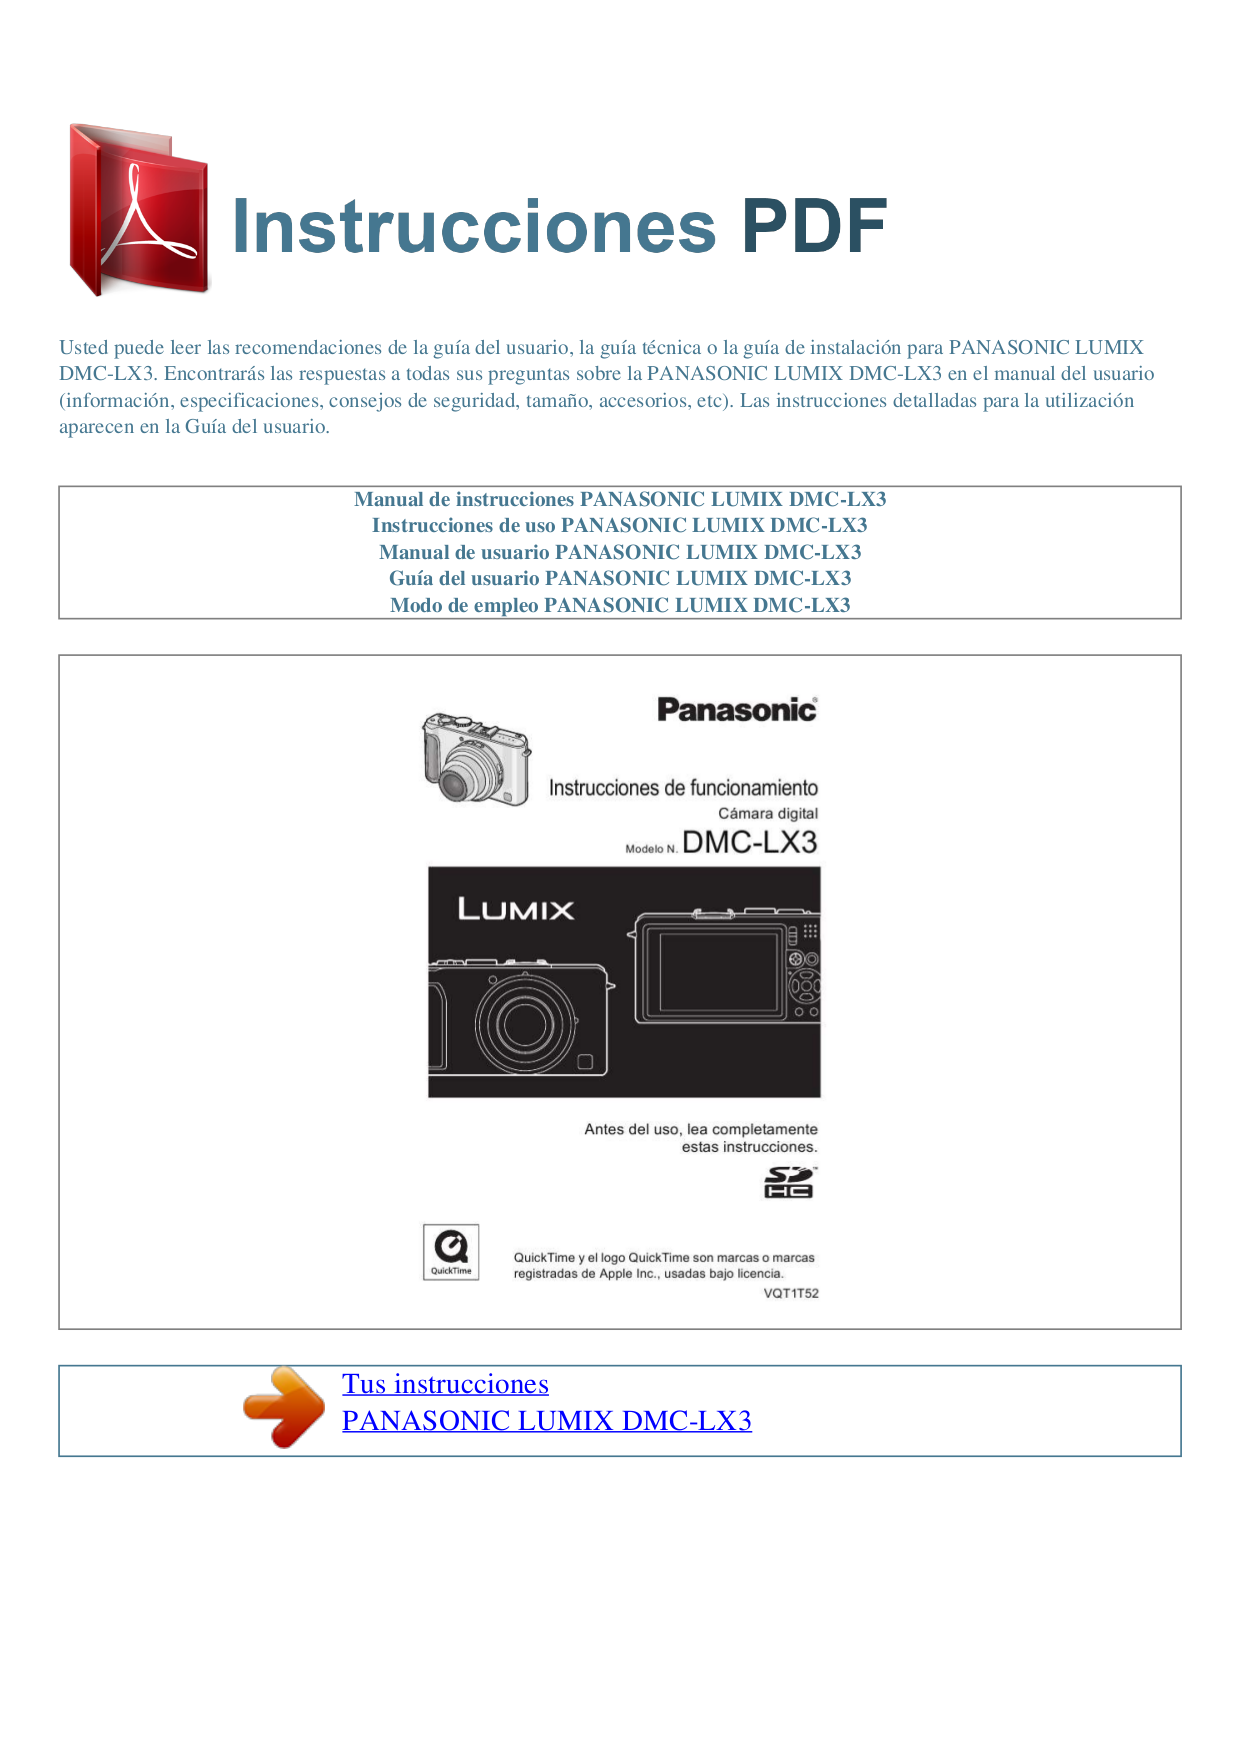 Panasonic lumix dmc lx3 instruction manual.